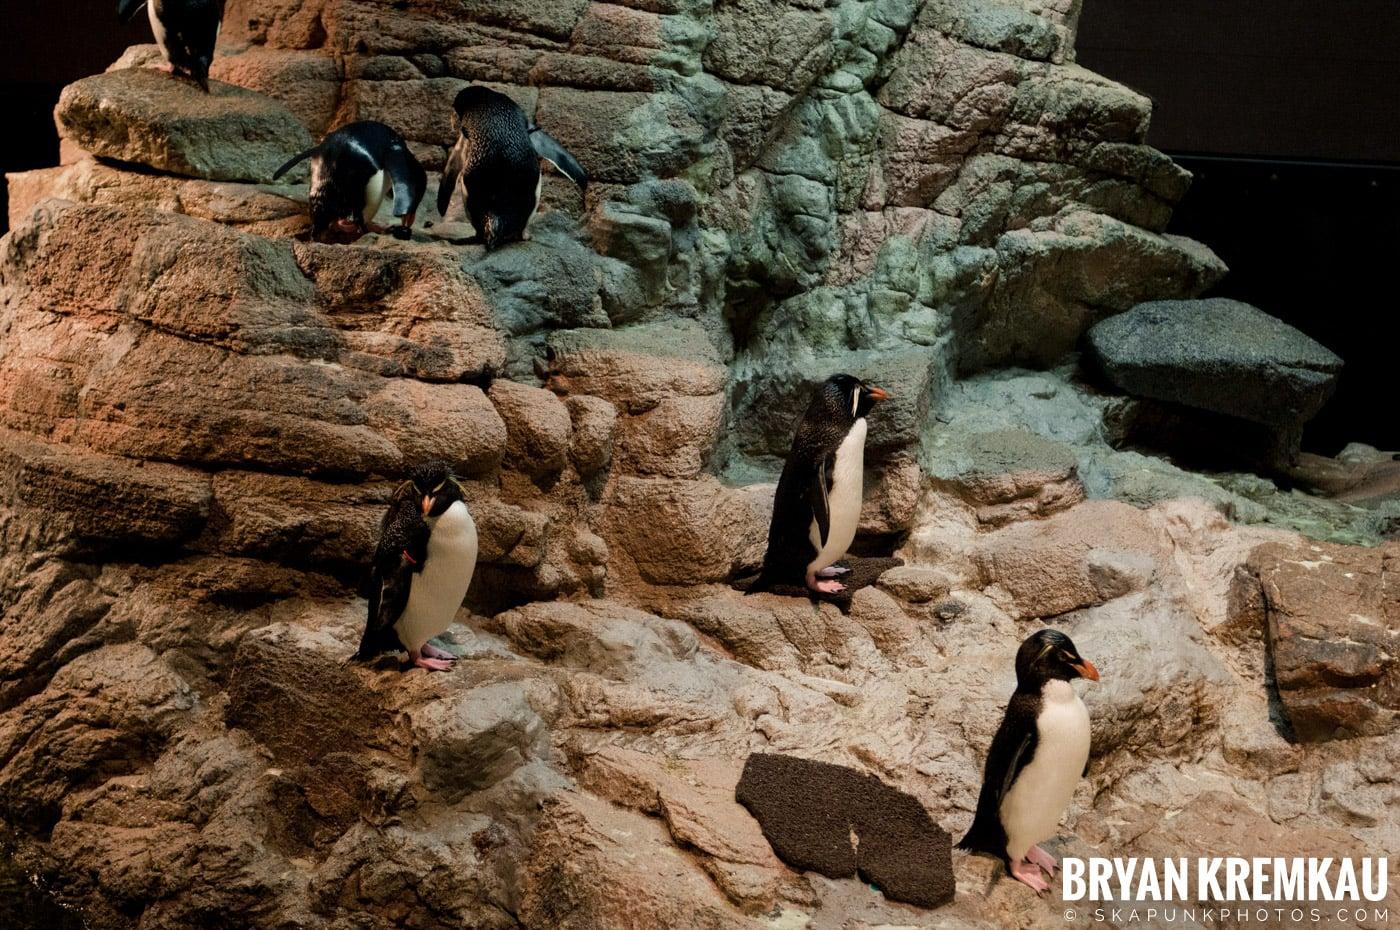 New England Aquarium @ Boston, MA - 6.2.12 (5)